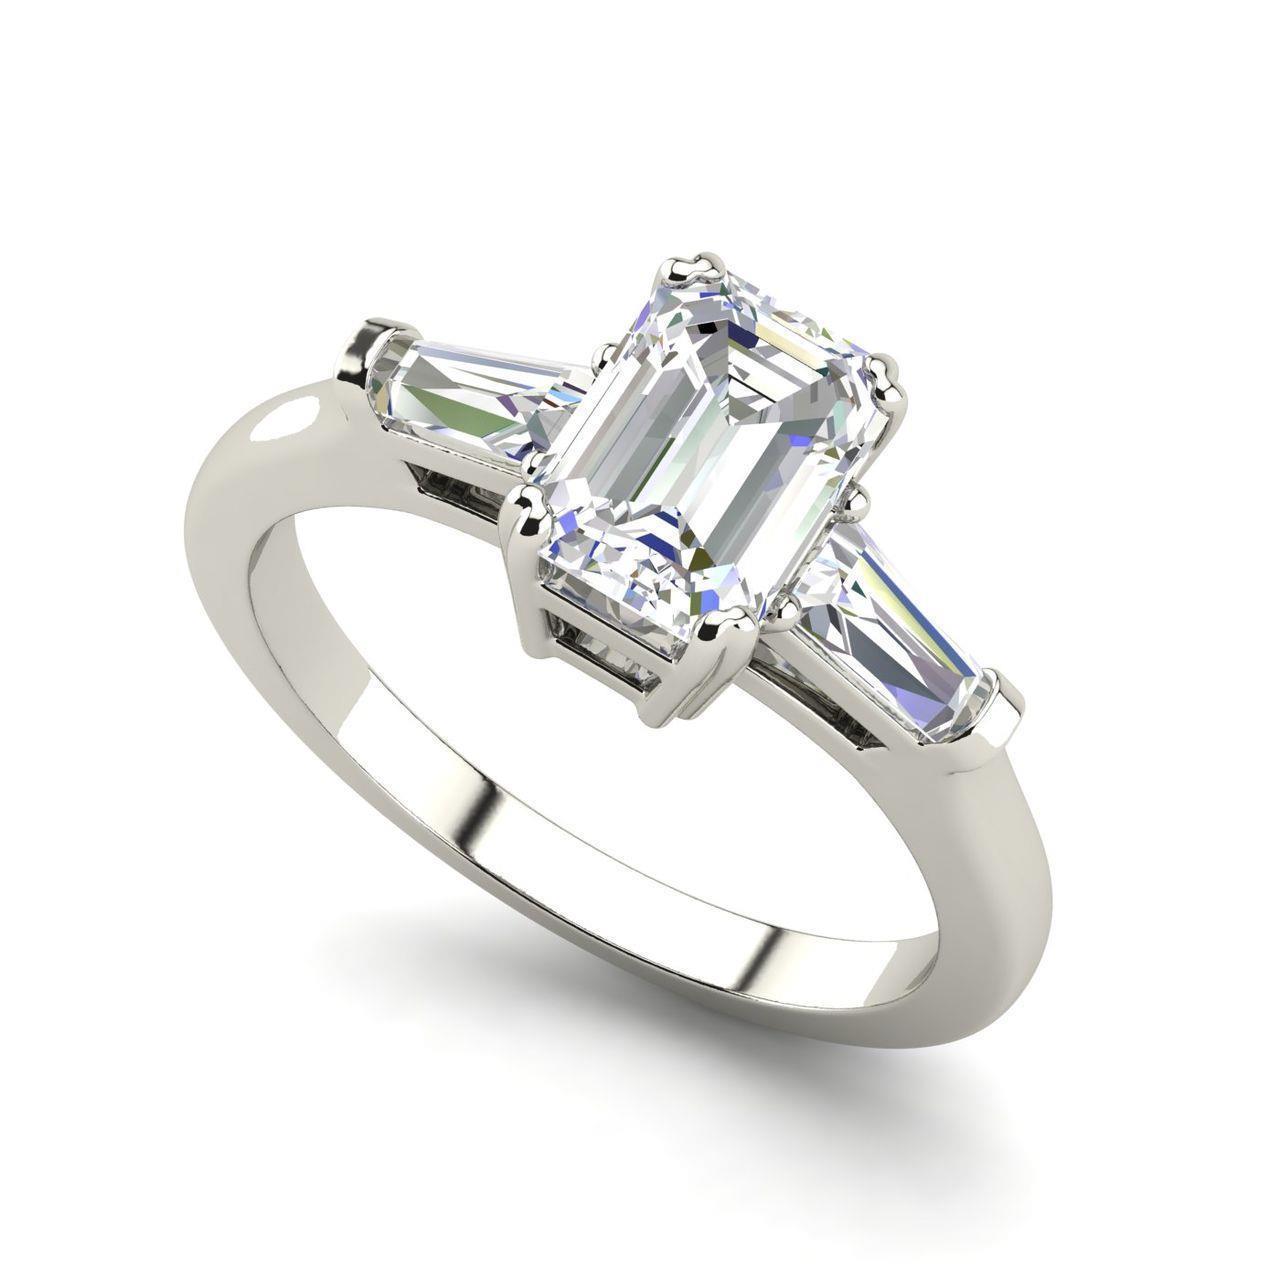 Baguette Accents 2 5 Ct Vs2 D Emerald Cut Diamond Engagement Ring White Gold Ebay